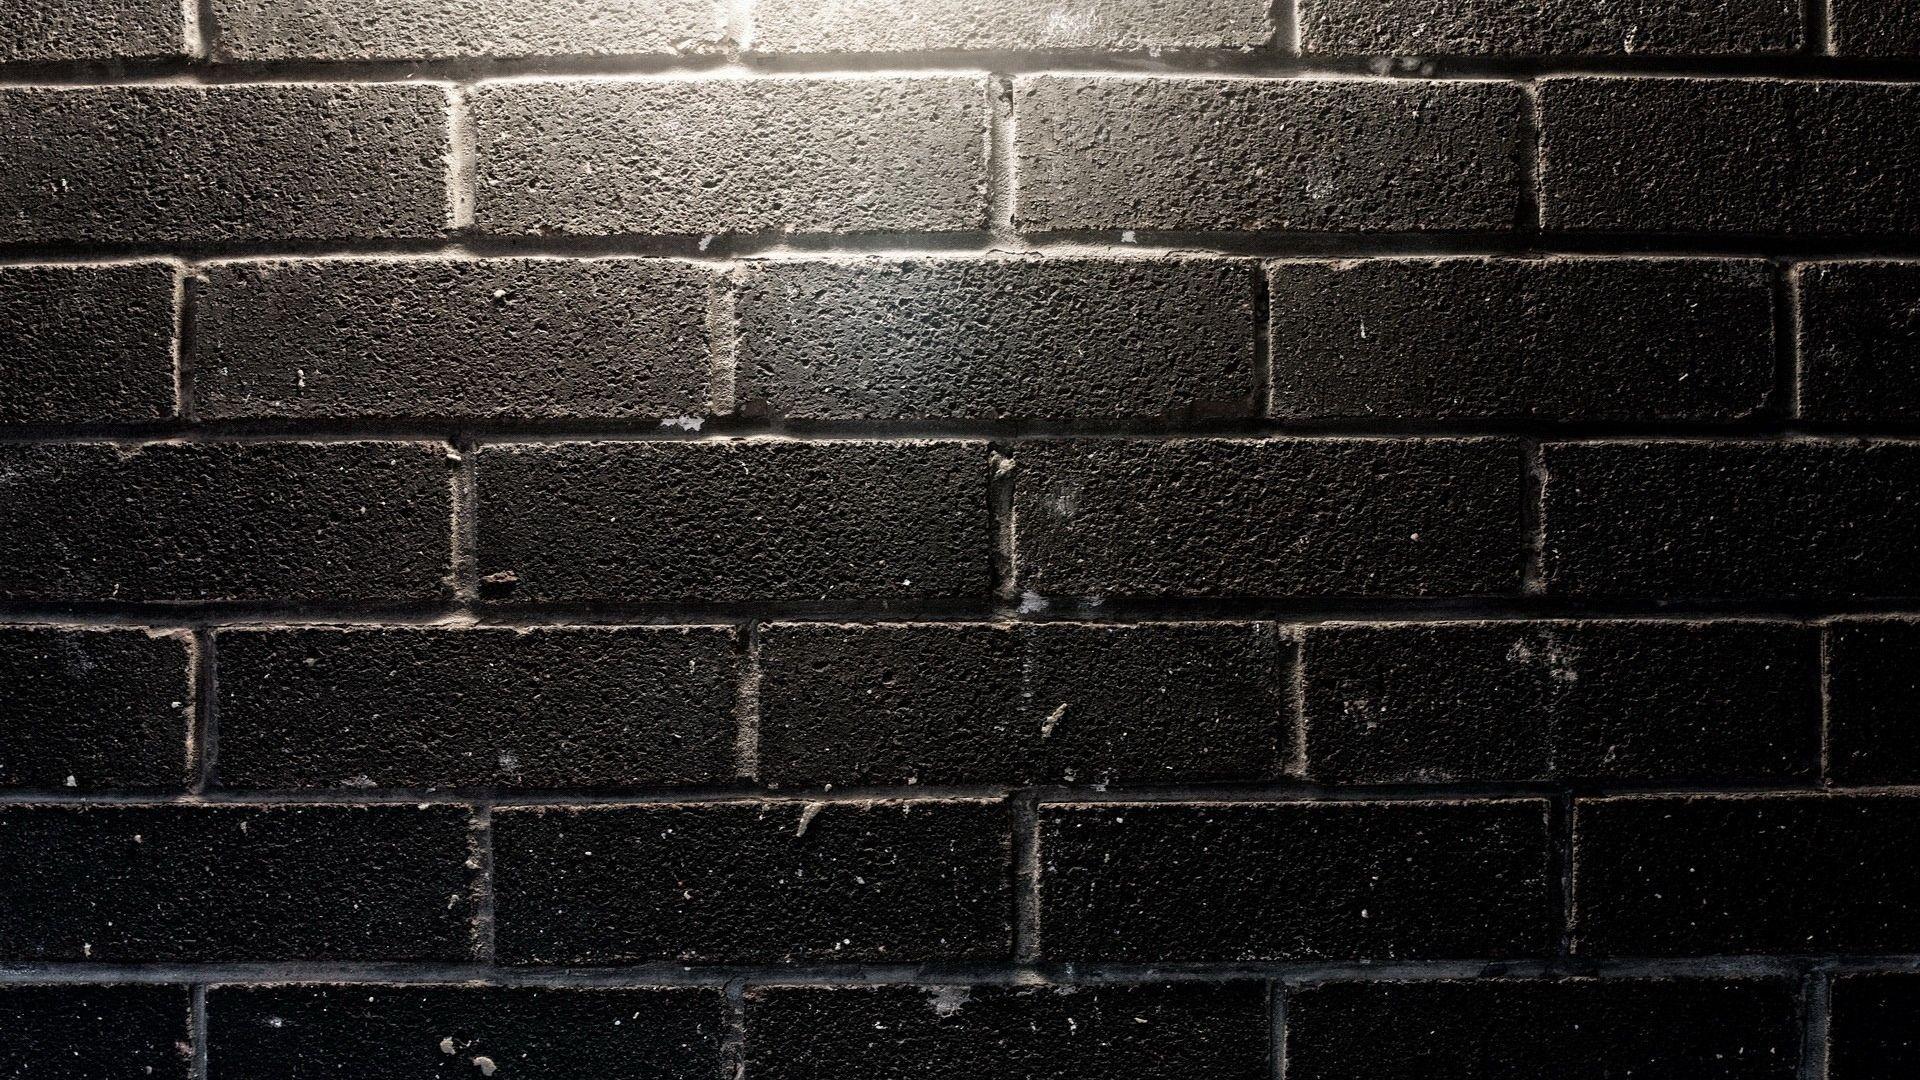 Wall Hd wallpaper 1080p